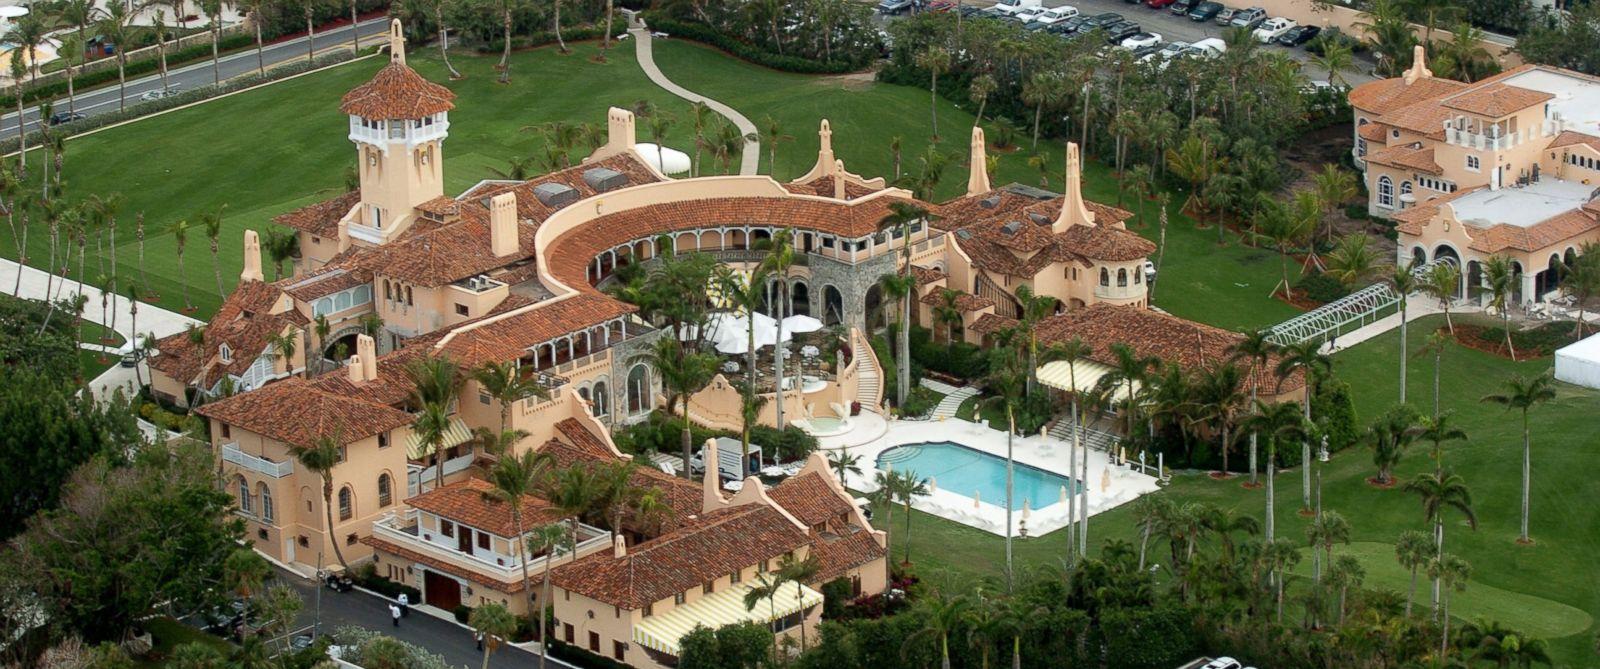 New Yorker: Donald Trump foloseste muncitori sezonieri din Romania si Haiti la luxosul sau club Mar-a-Lago din Palm Beach